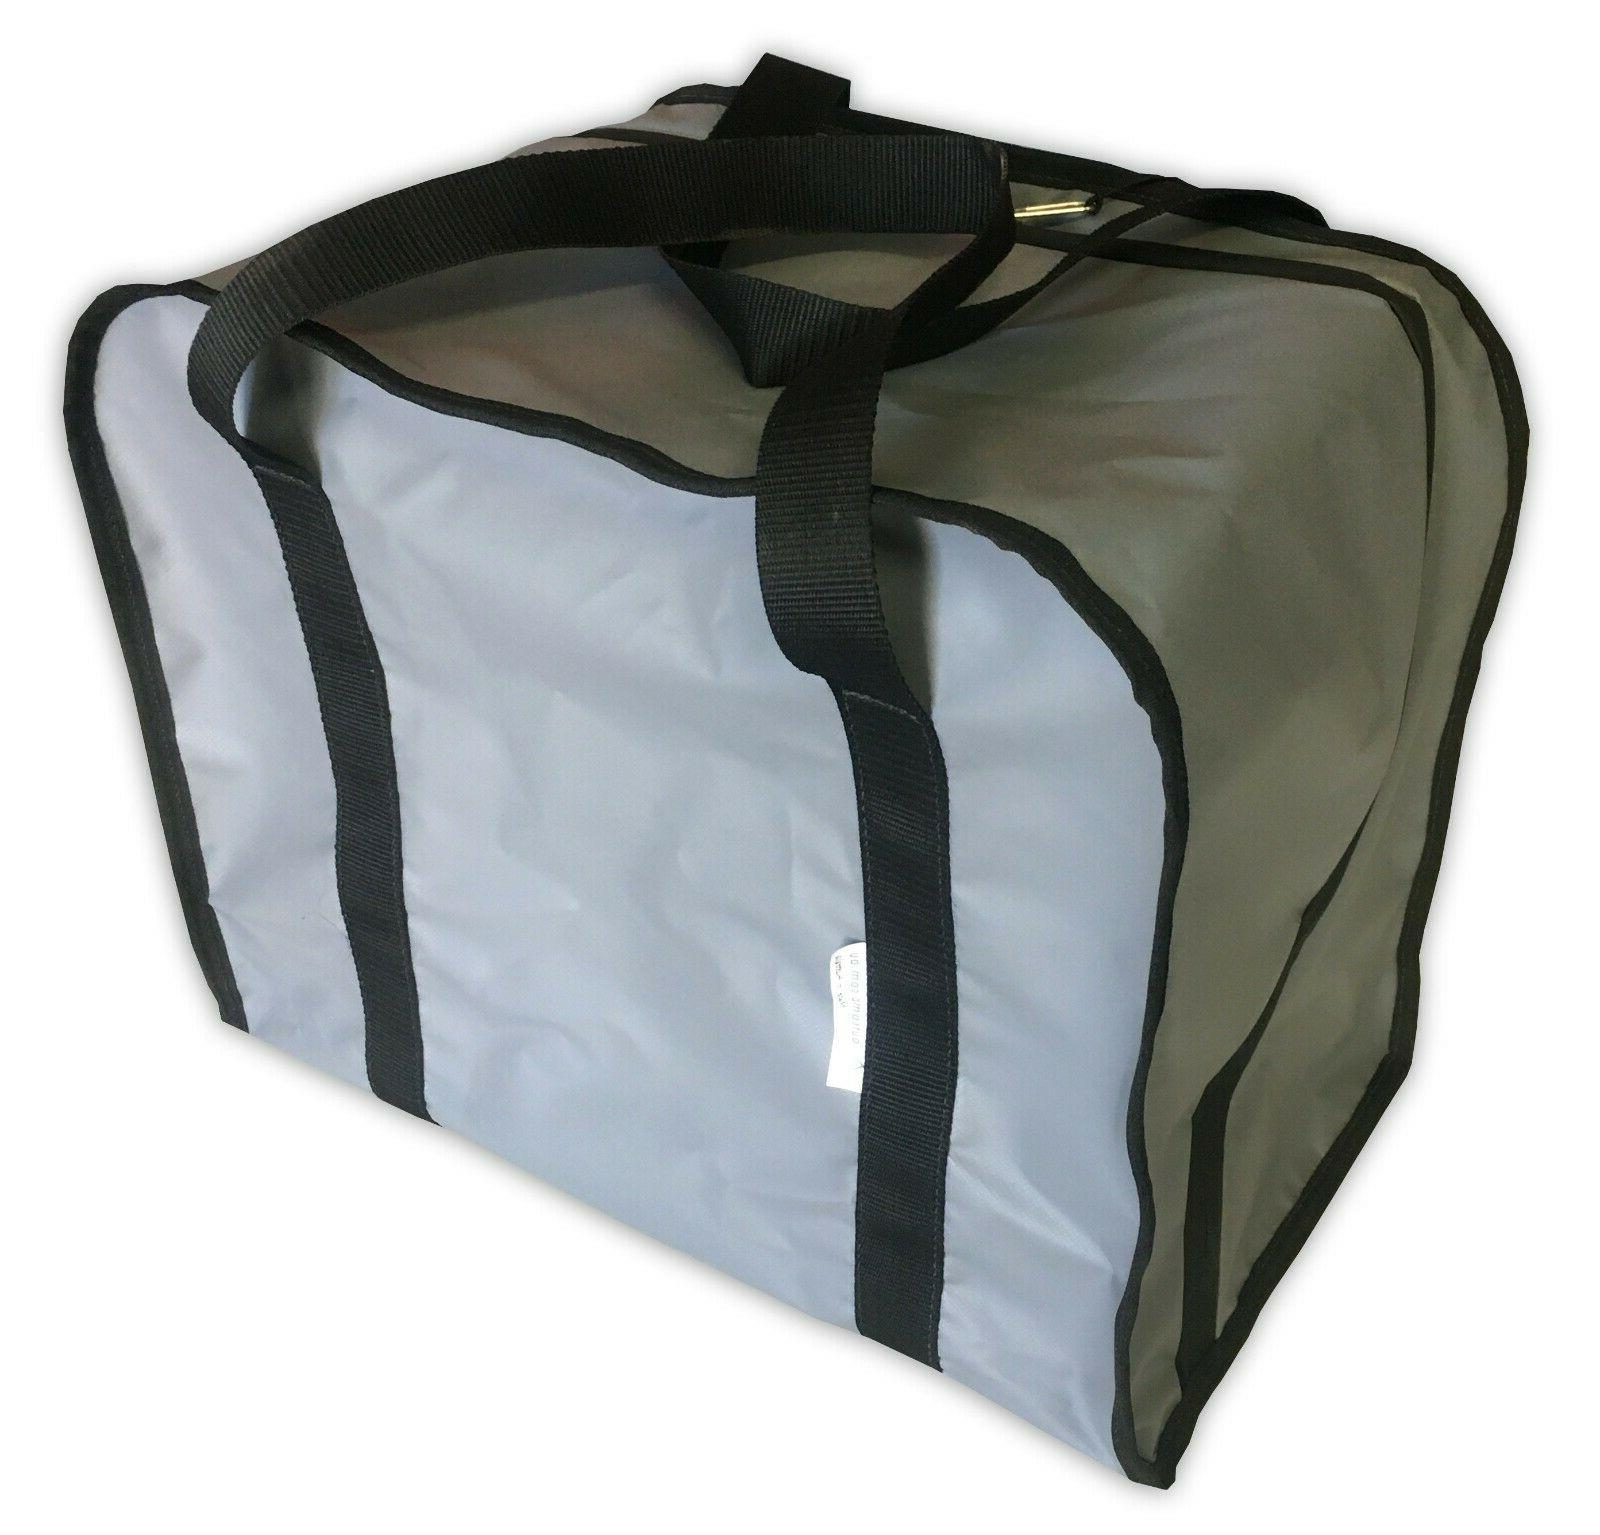 Yamaha EF1000is Generator Bag camping.